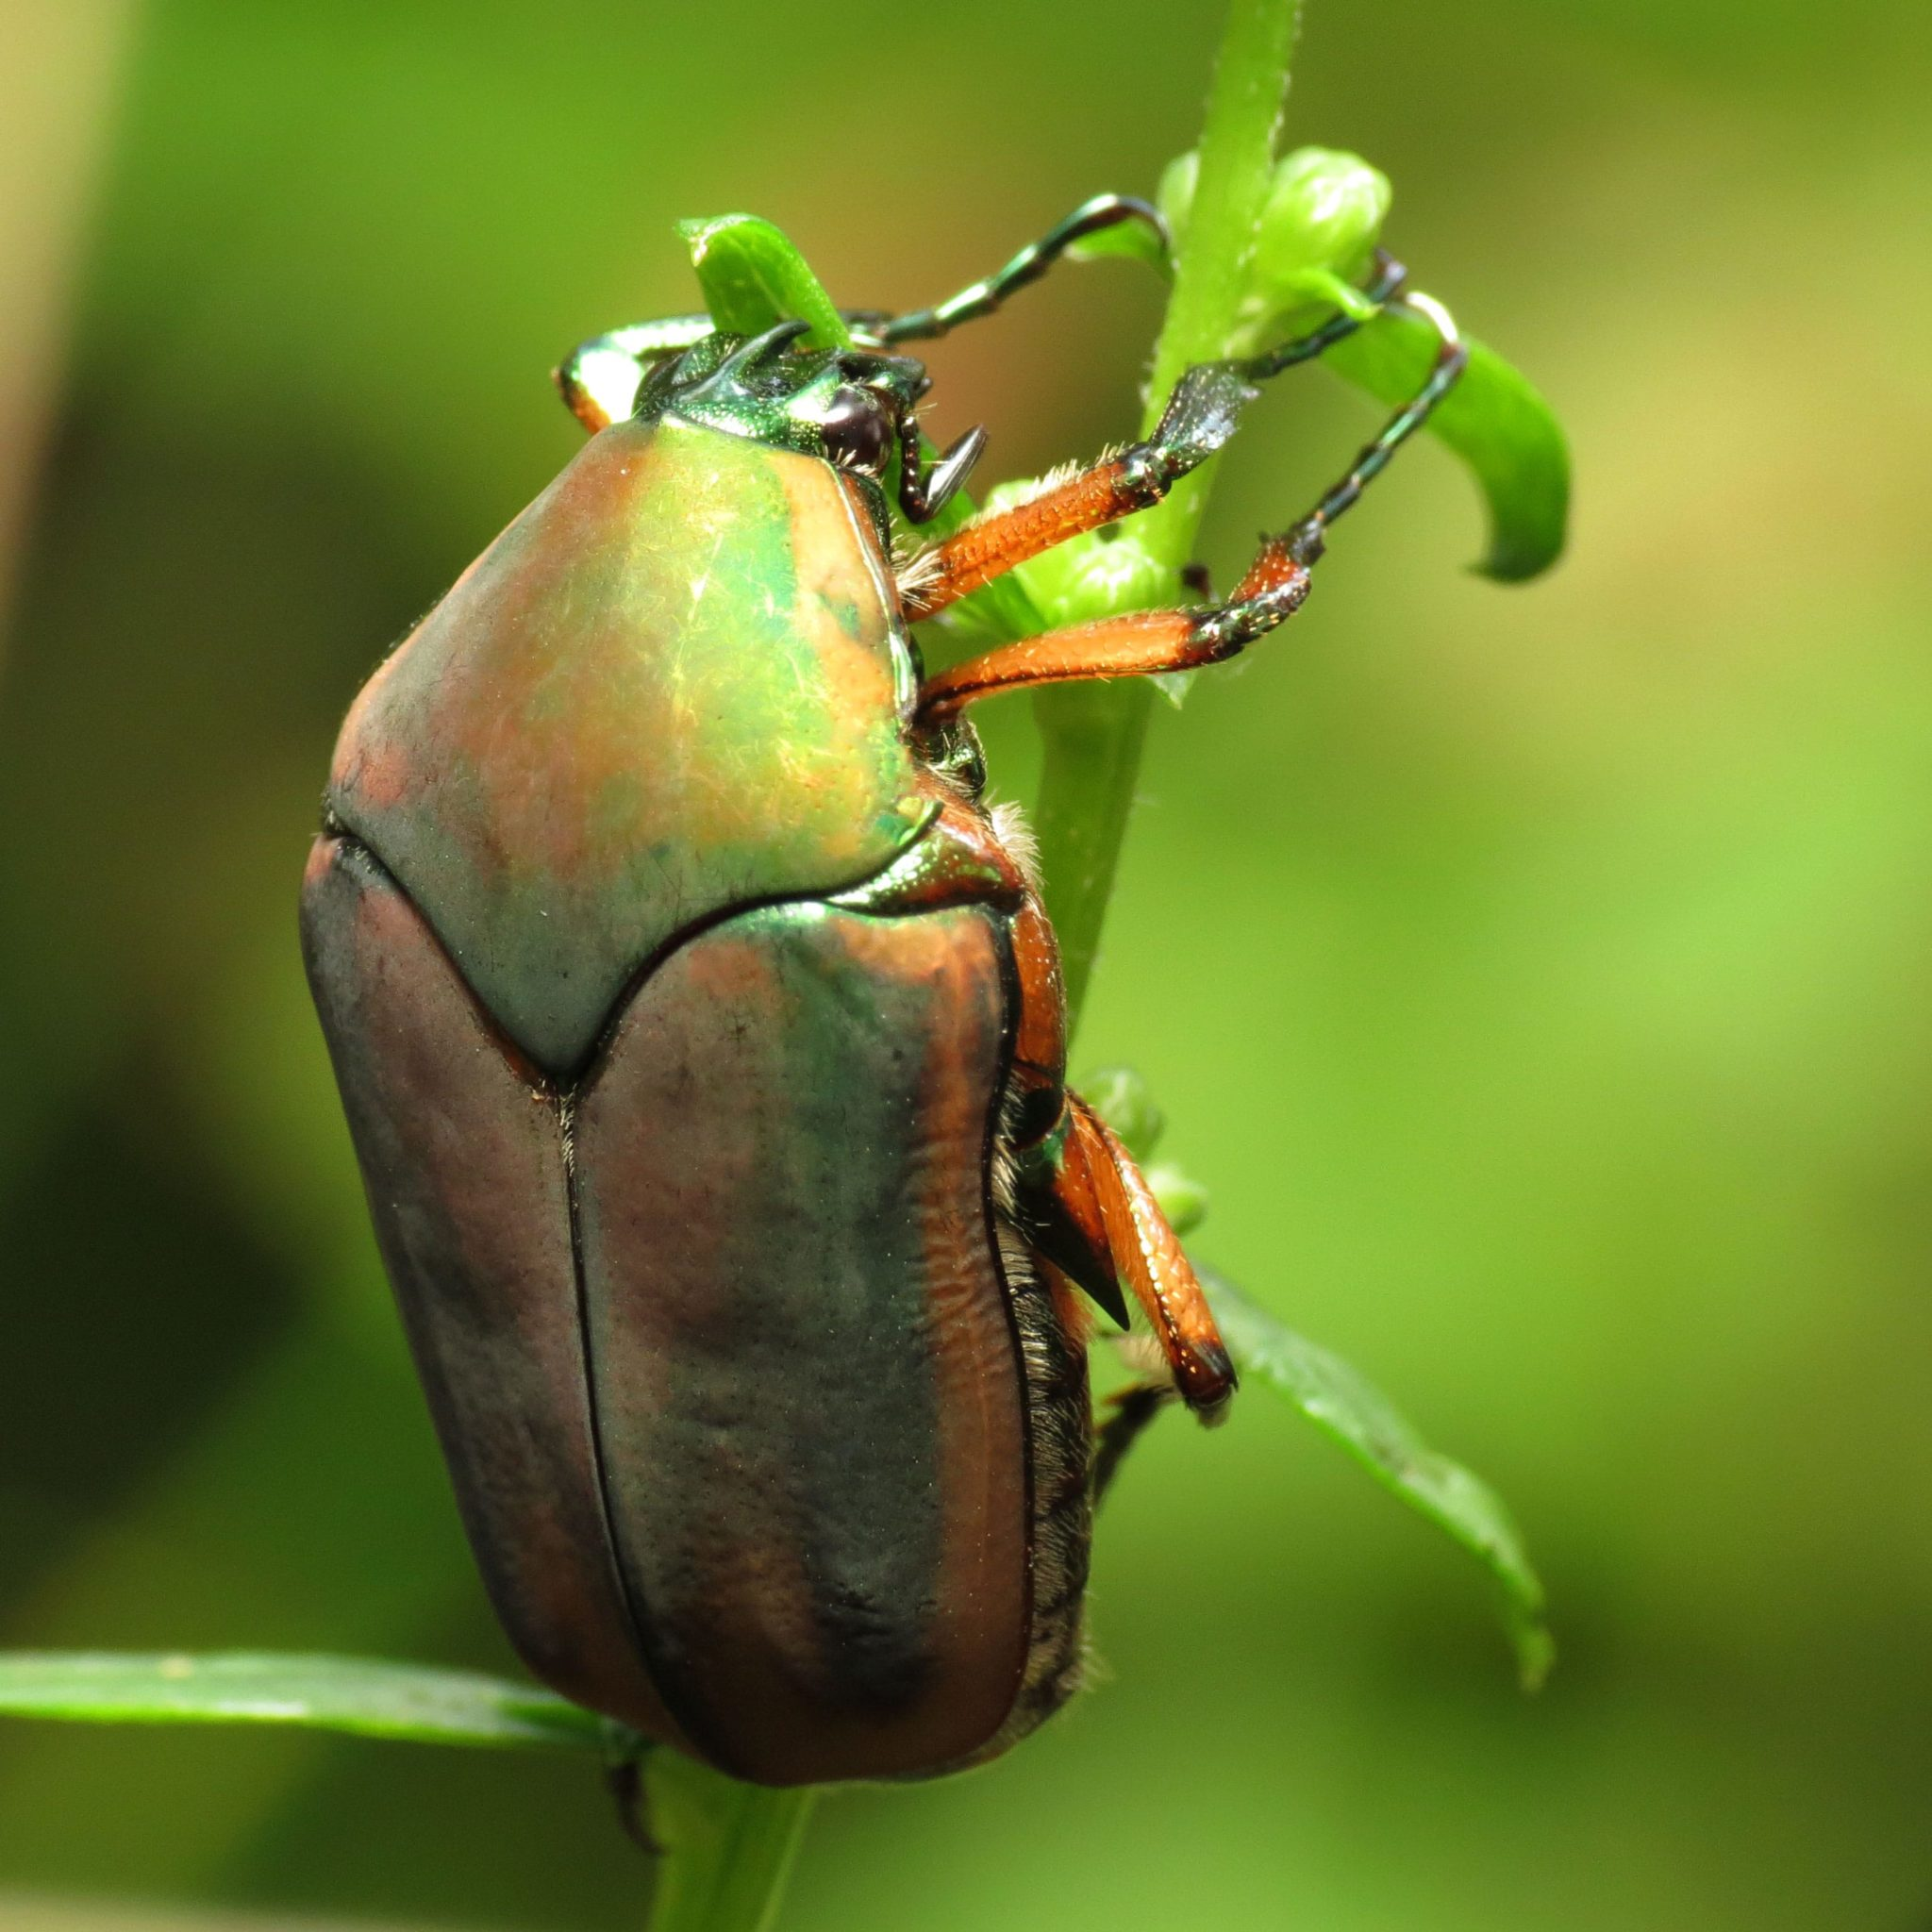 Green June Beetles - photo#16